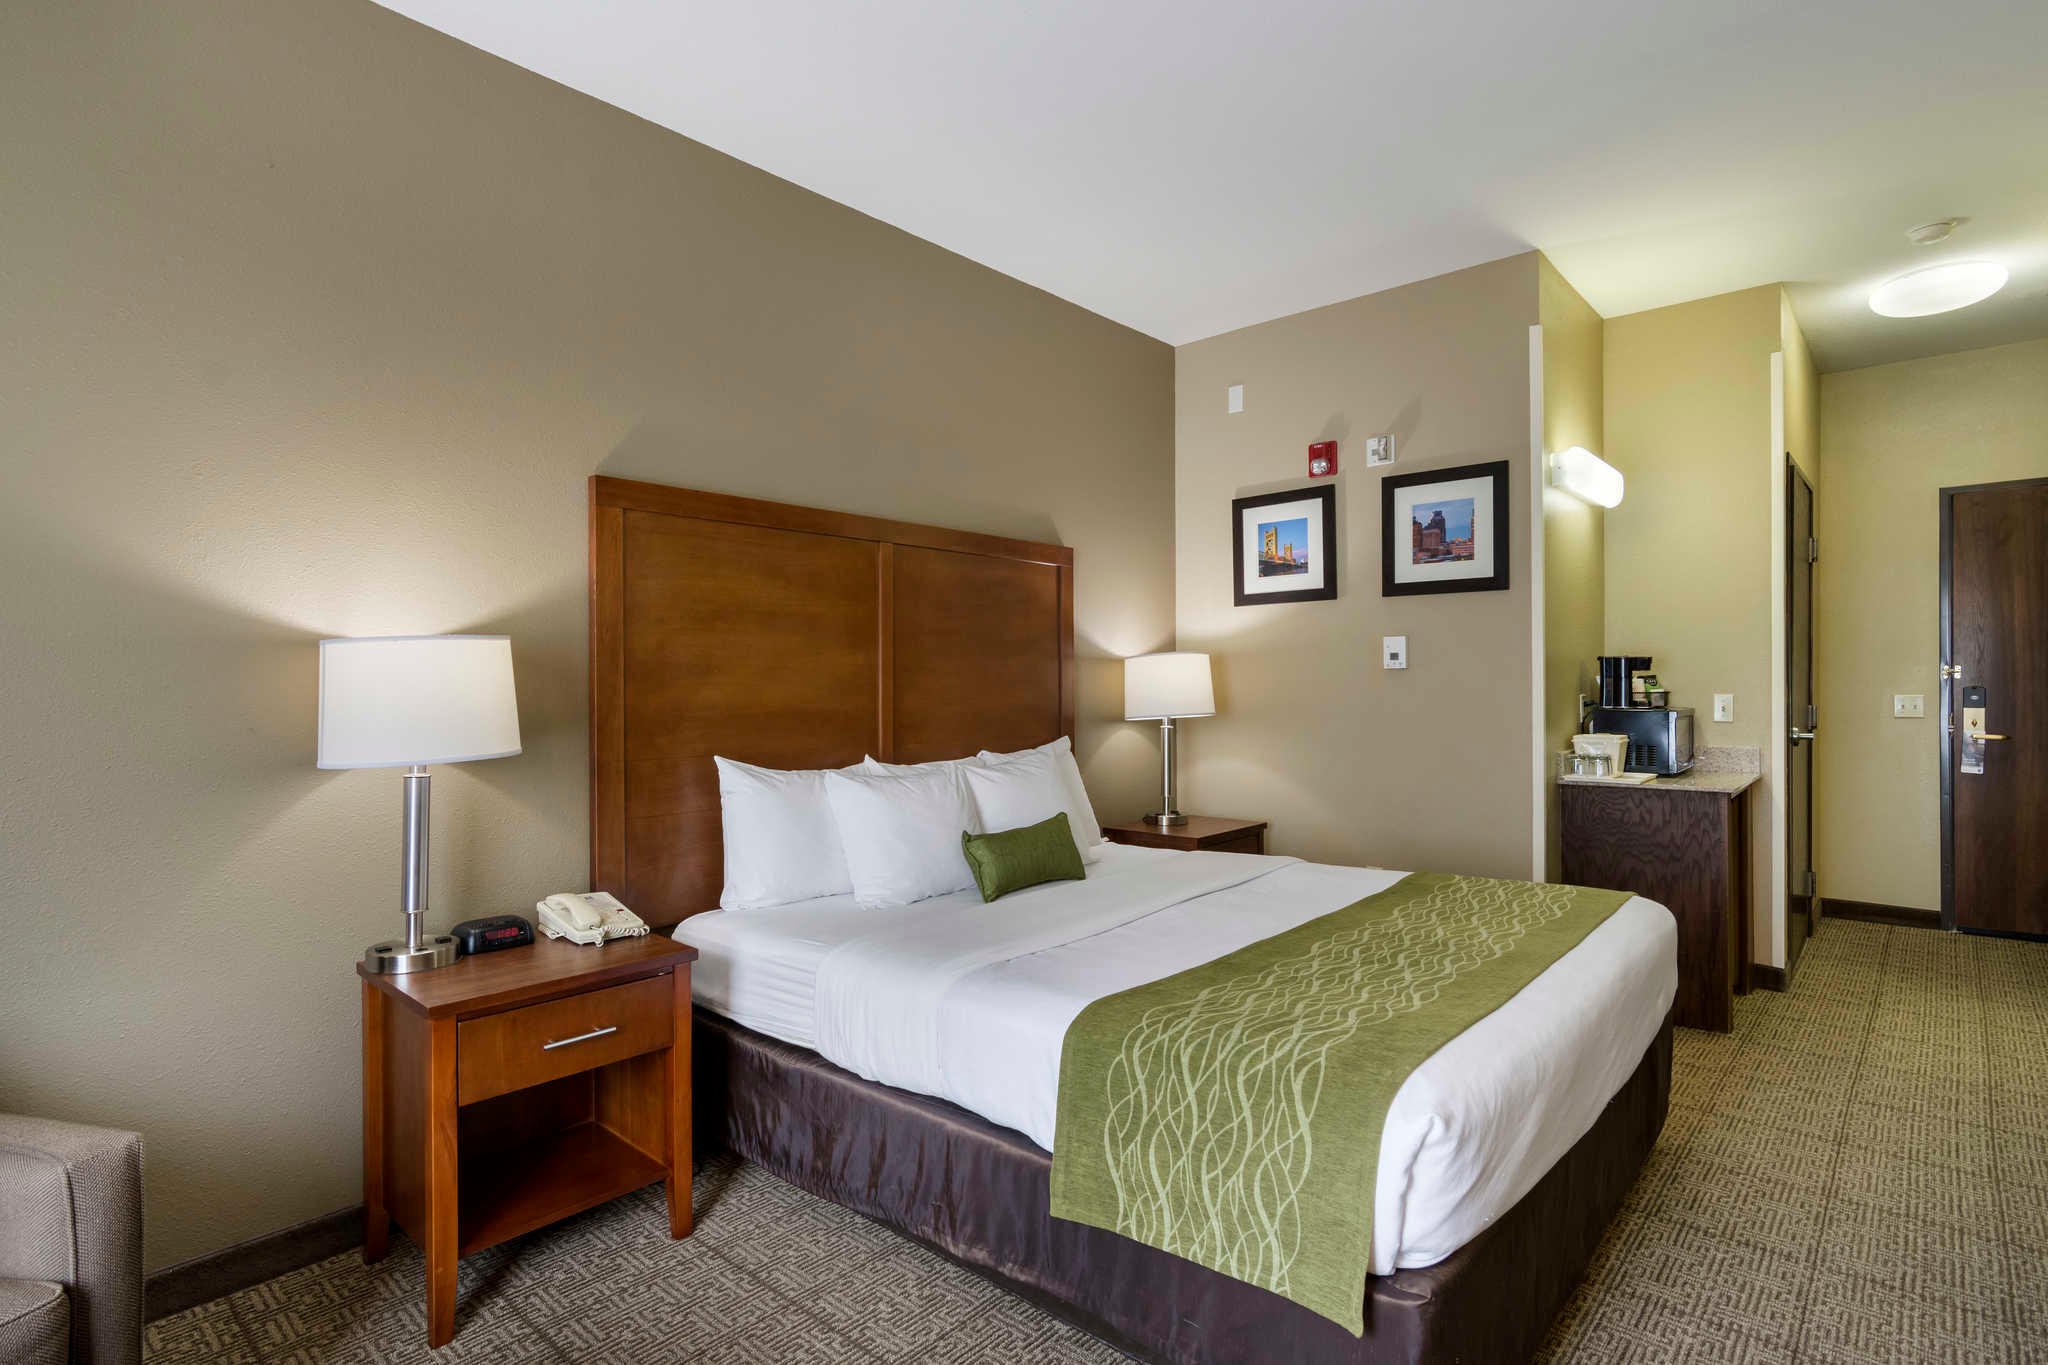 Comfort Inn & Suites Sacramento - University Area image 9